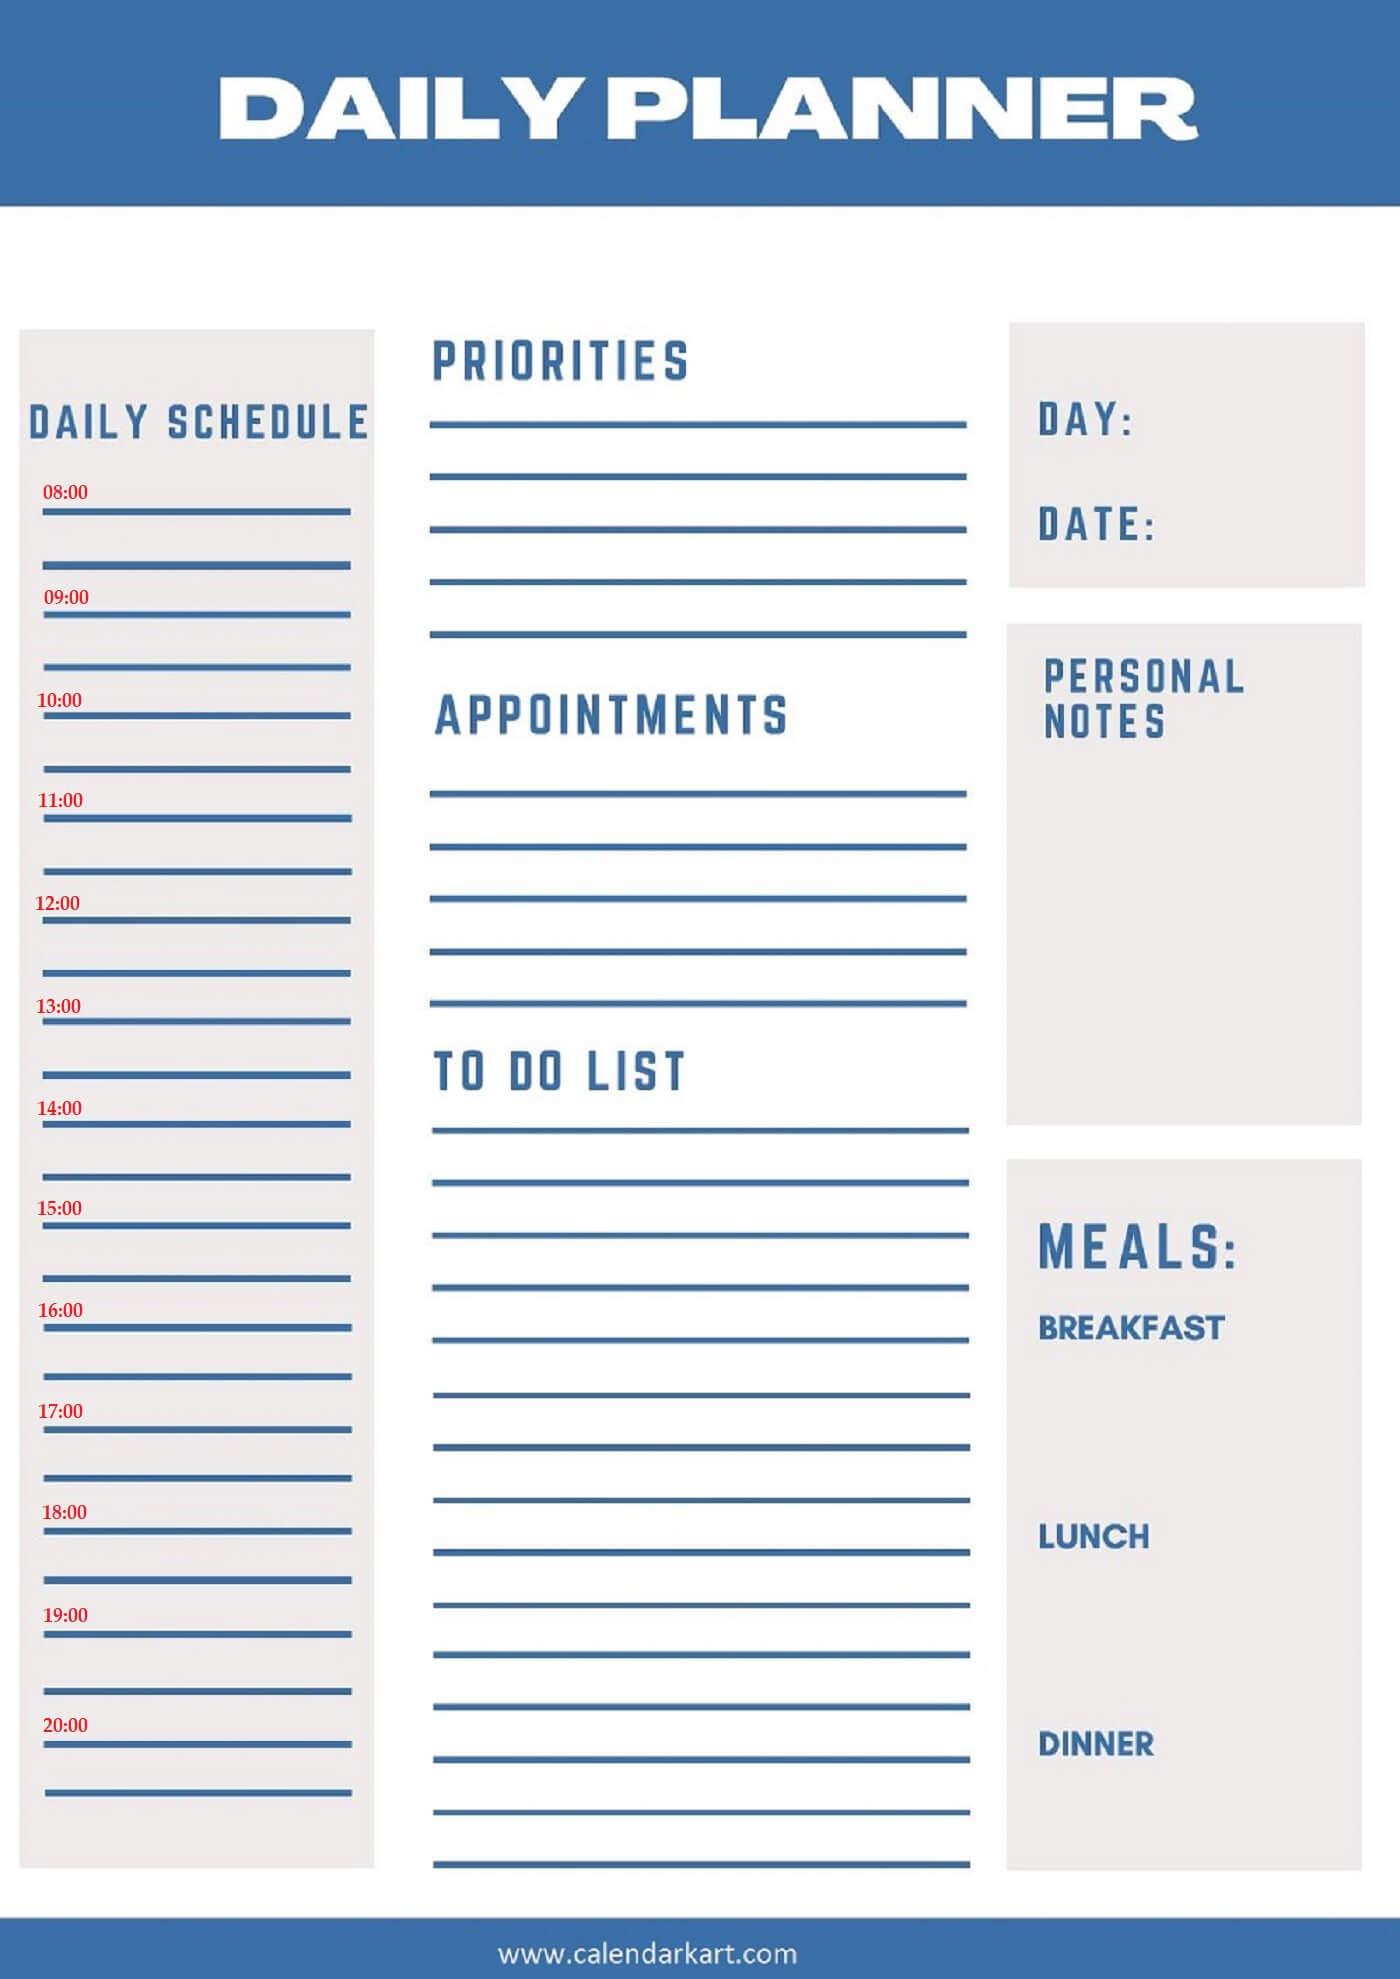 Free Printable Daily Planner 2021 Templates » Calendarkart